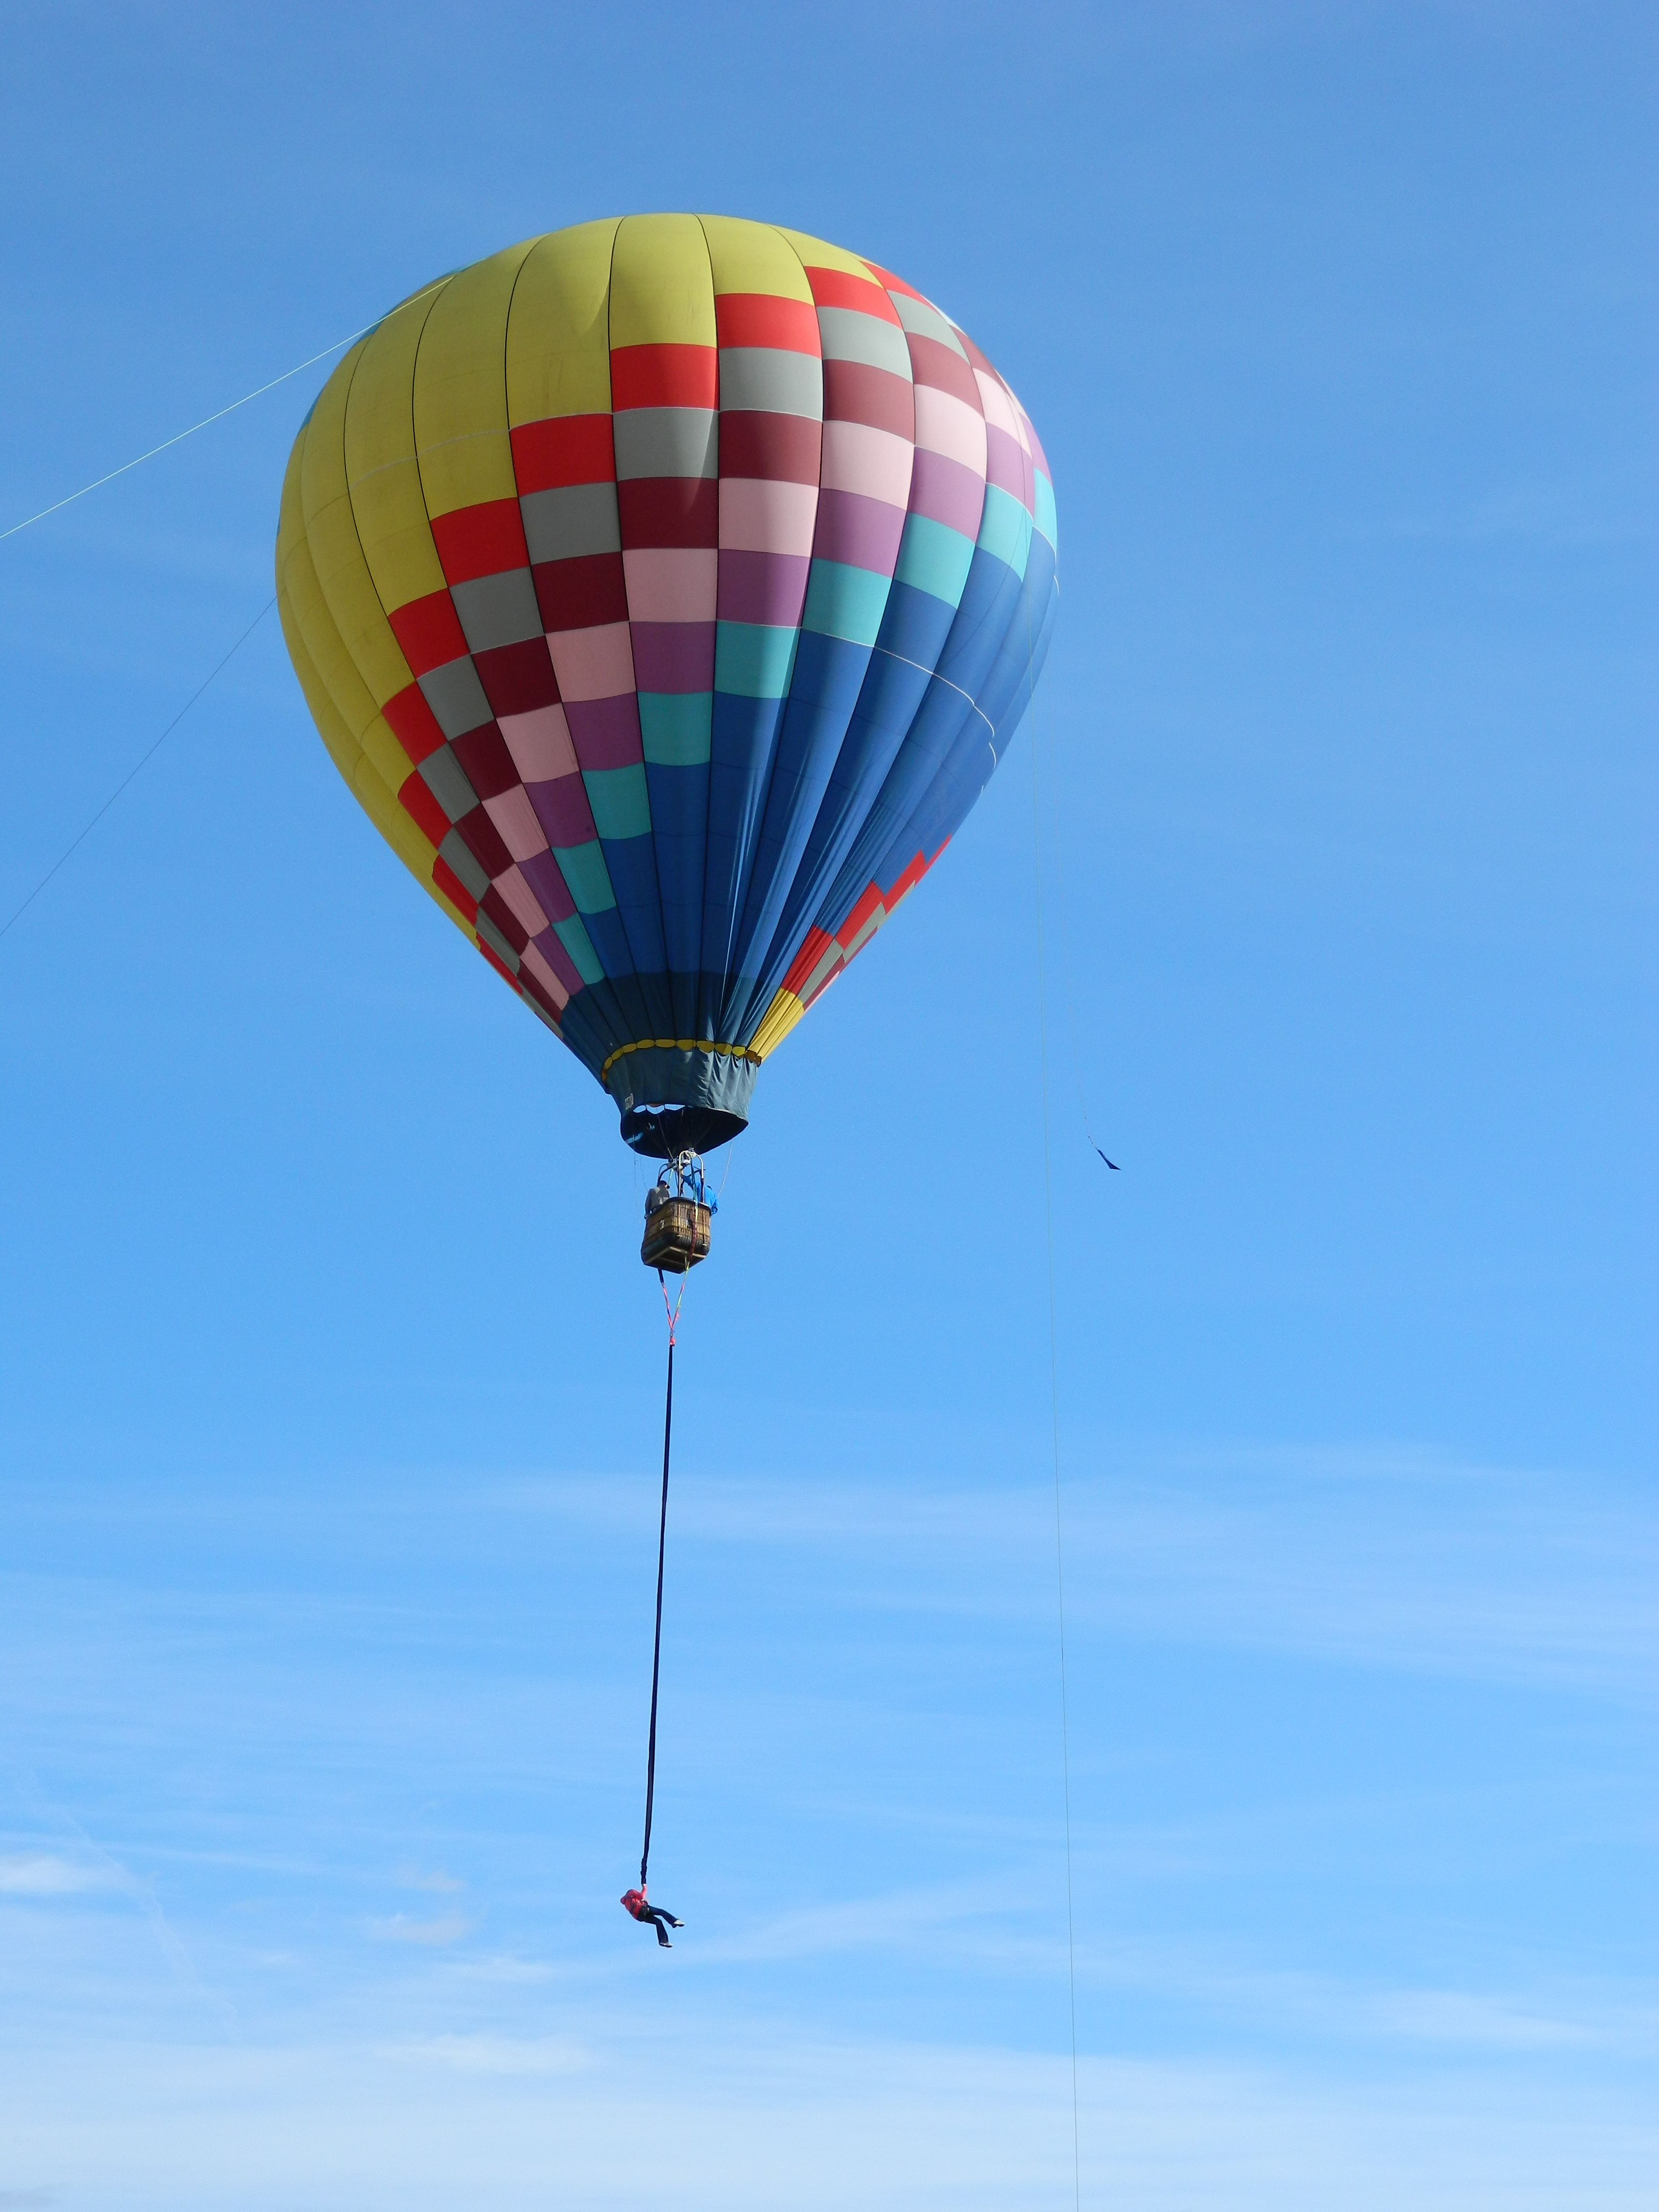 Bungee Jump out of a Hot Air Balloon Balloons, Hot air